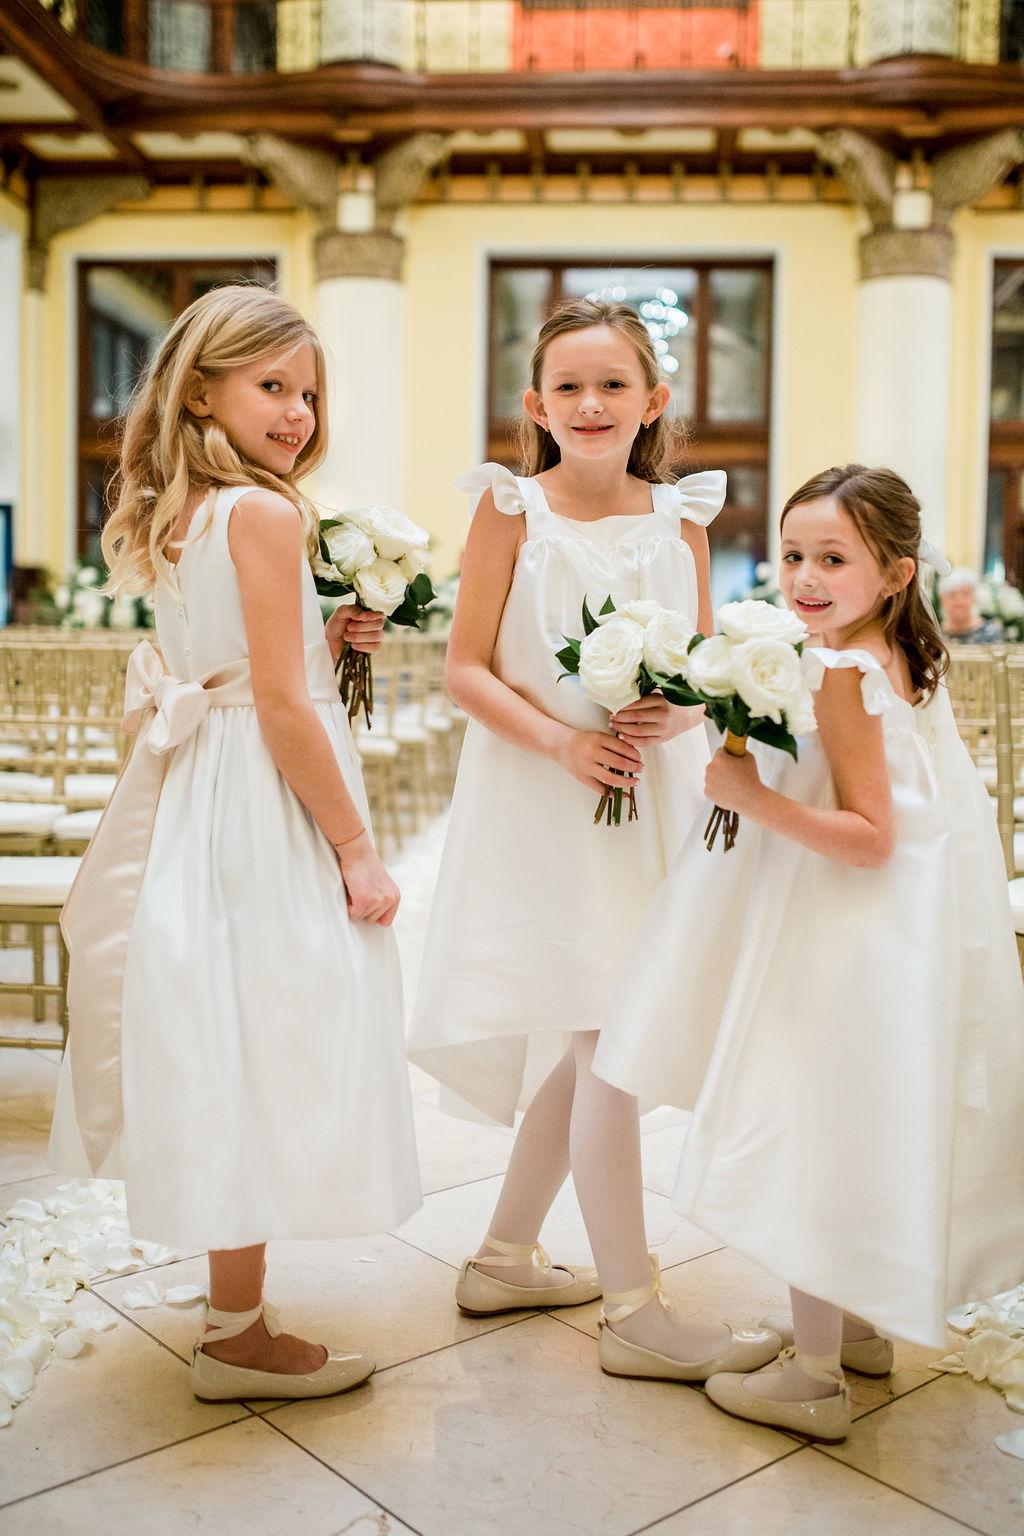 Flower girl dresses: Lavish Union Station Hotel Wedding featured on Nashville Bride Guide